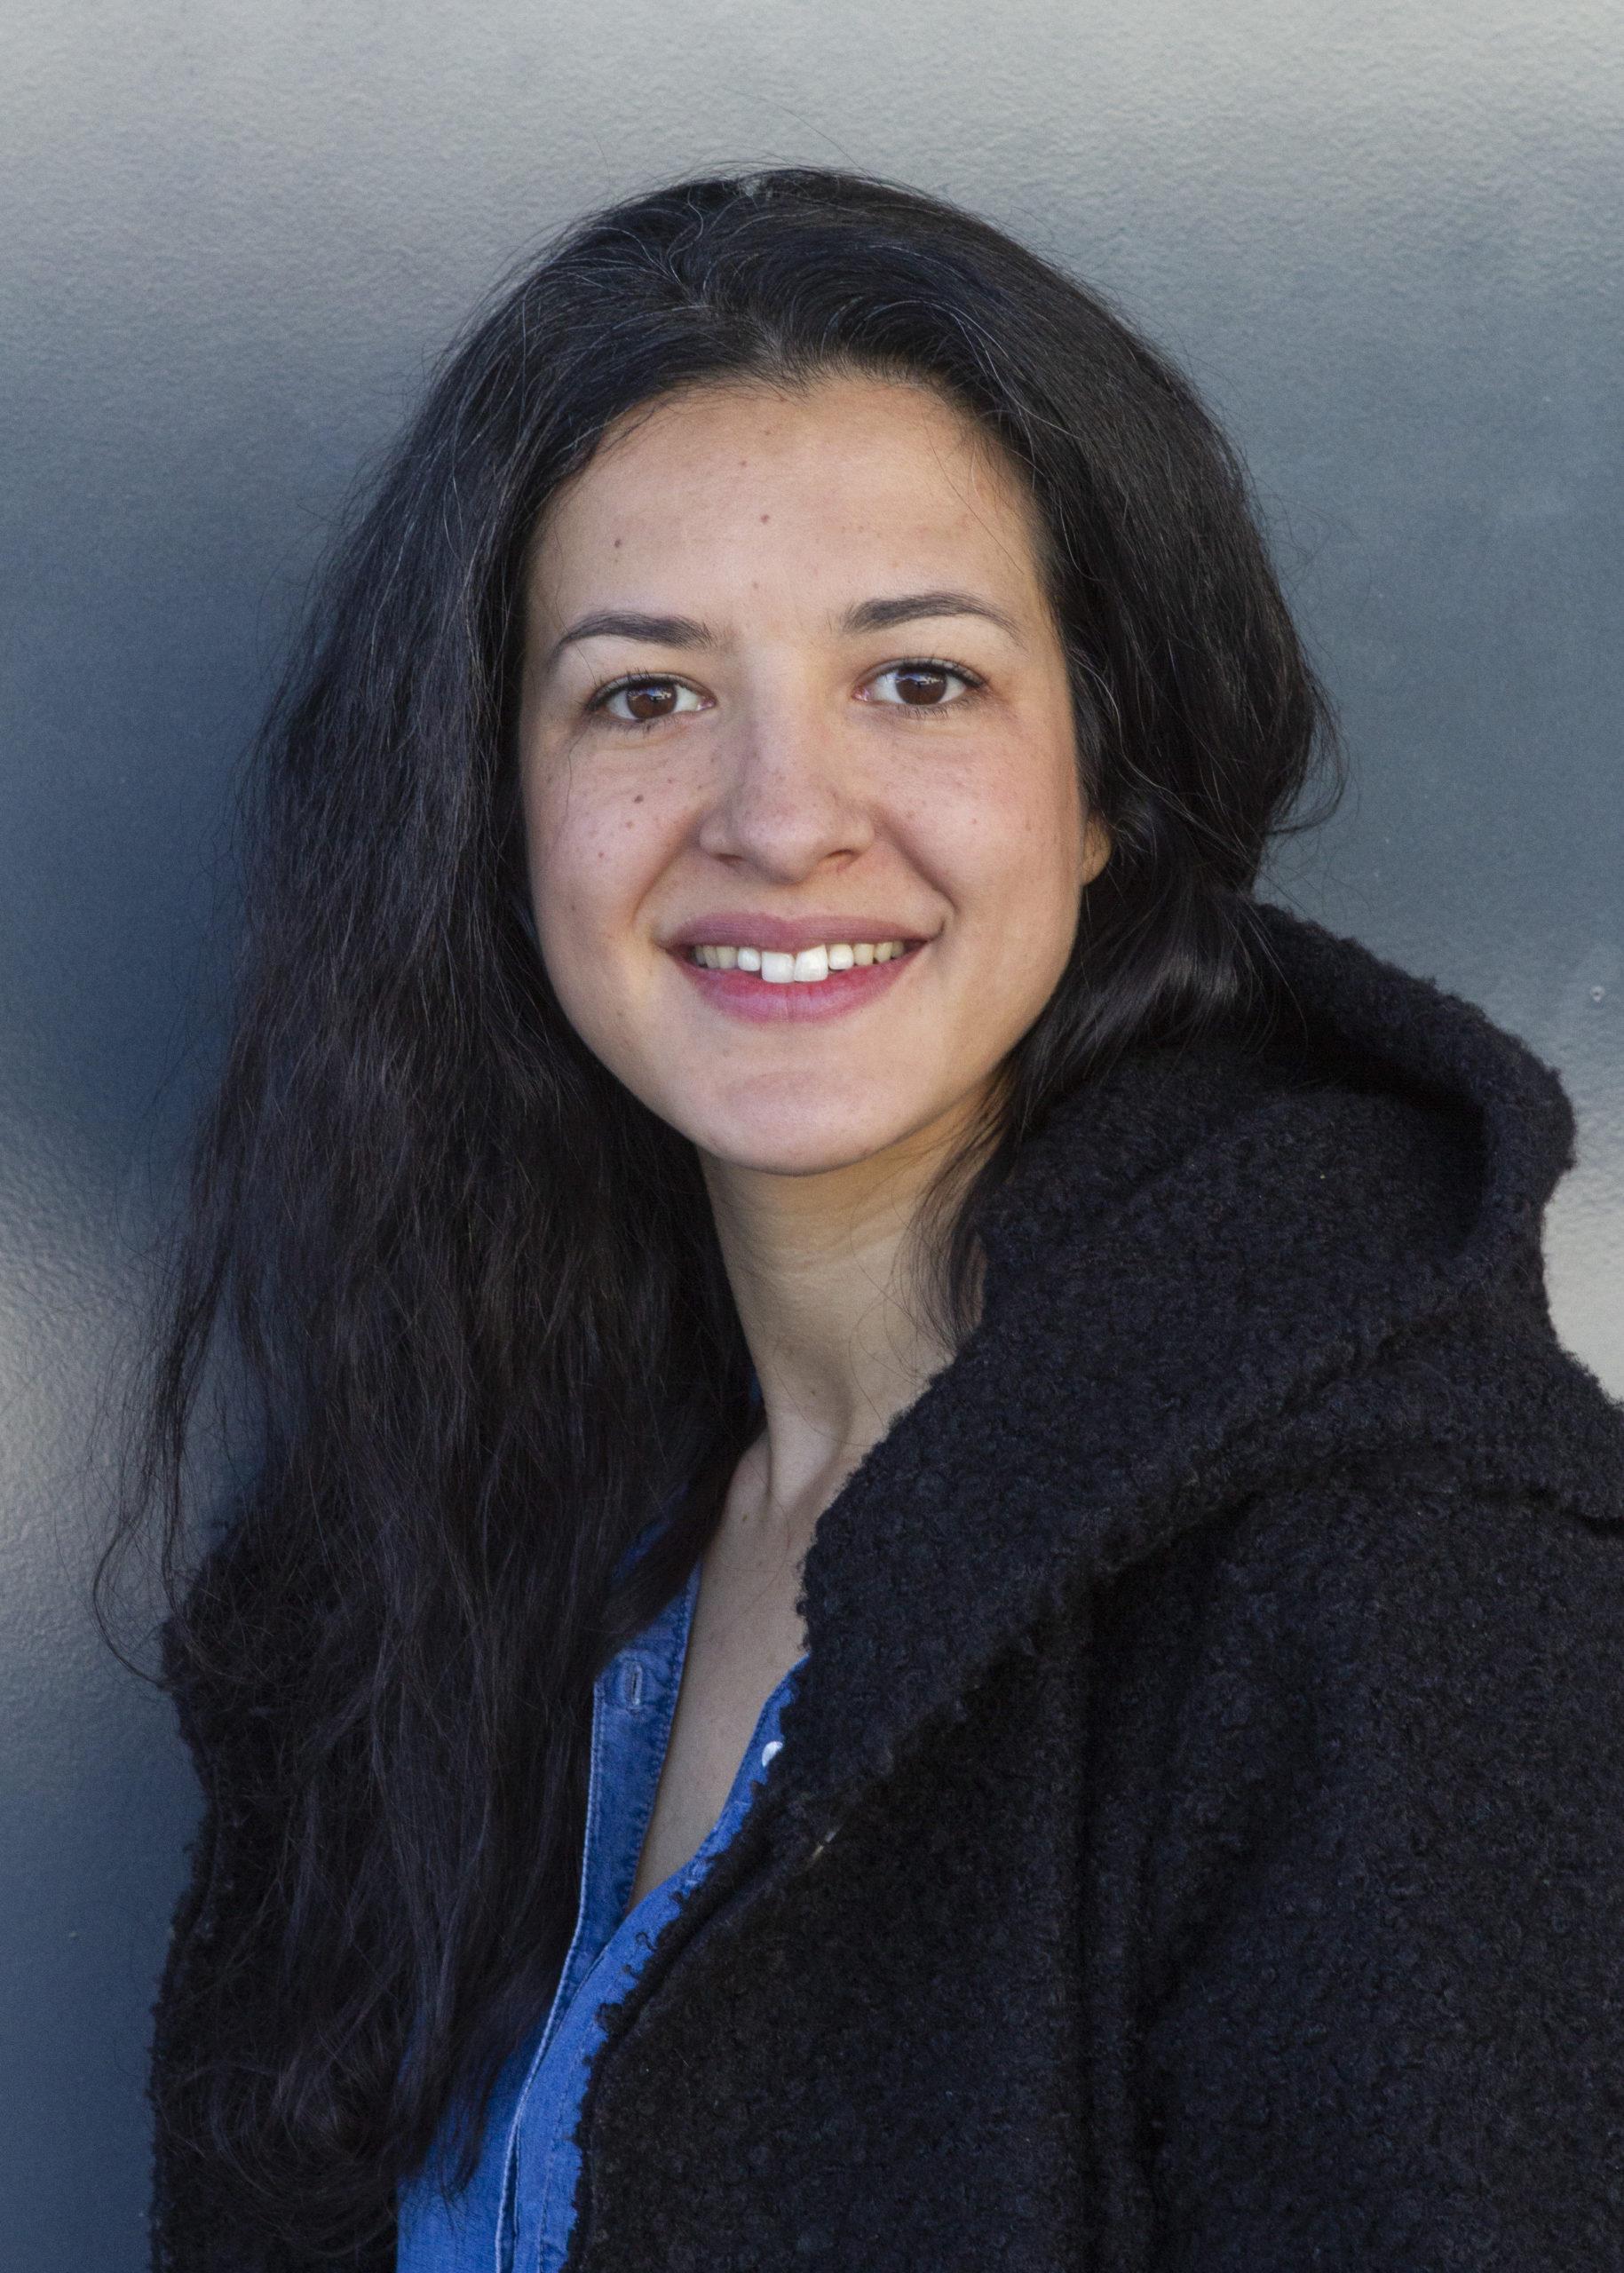 Carine Antonio @Marine Vallotton